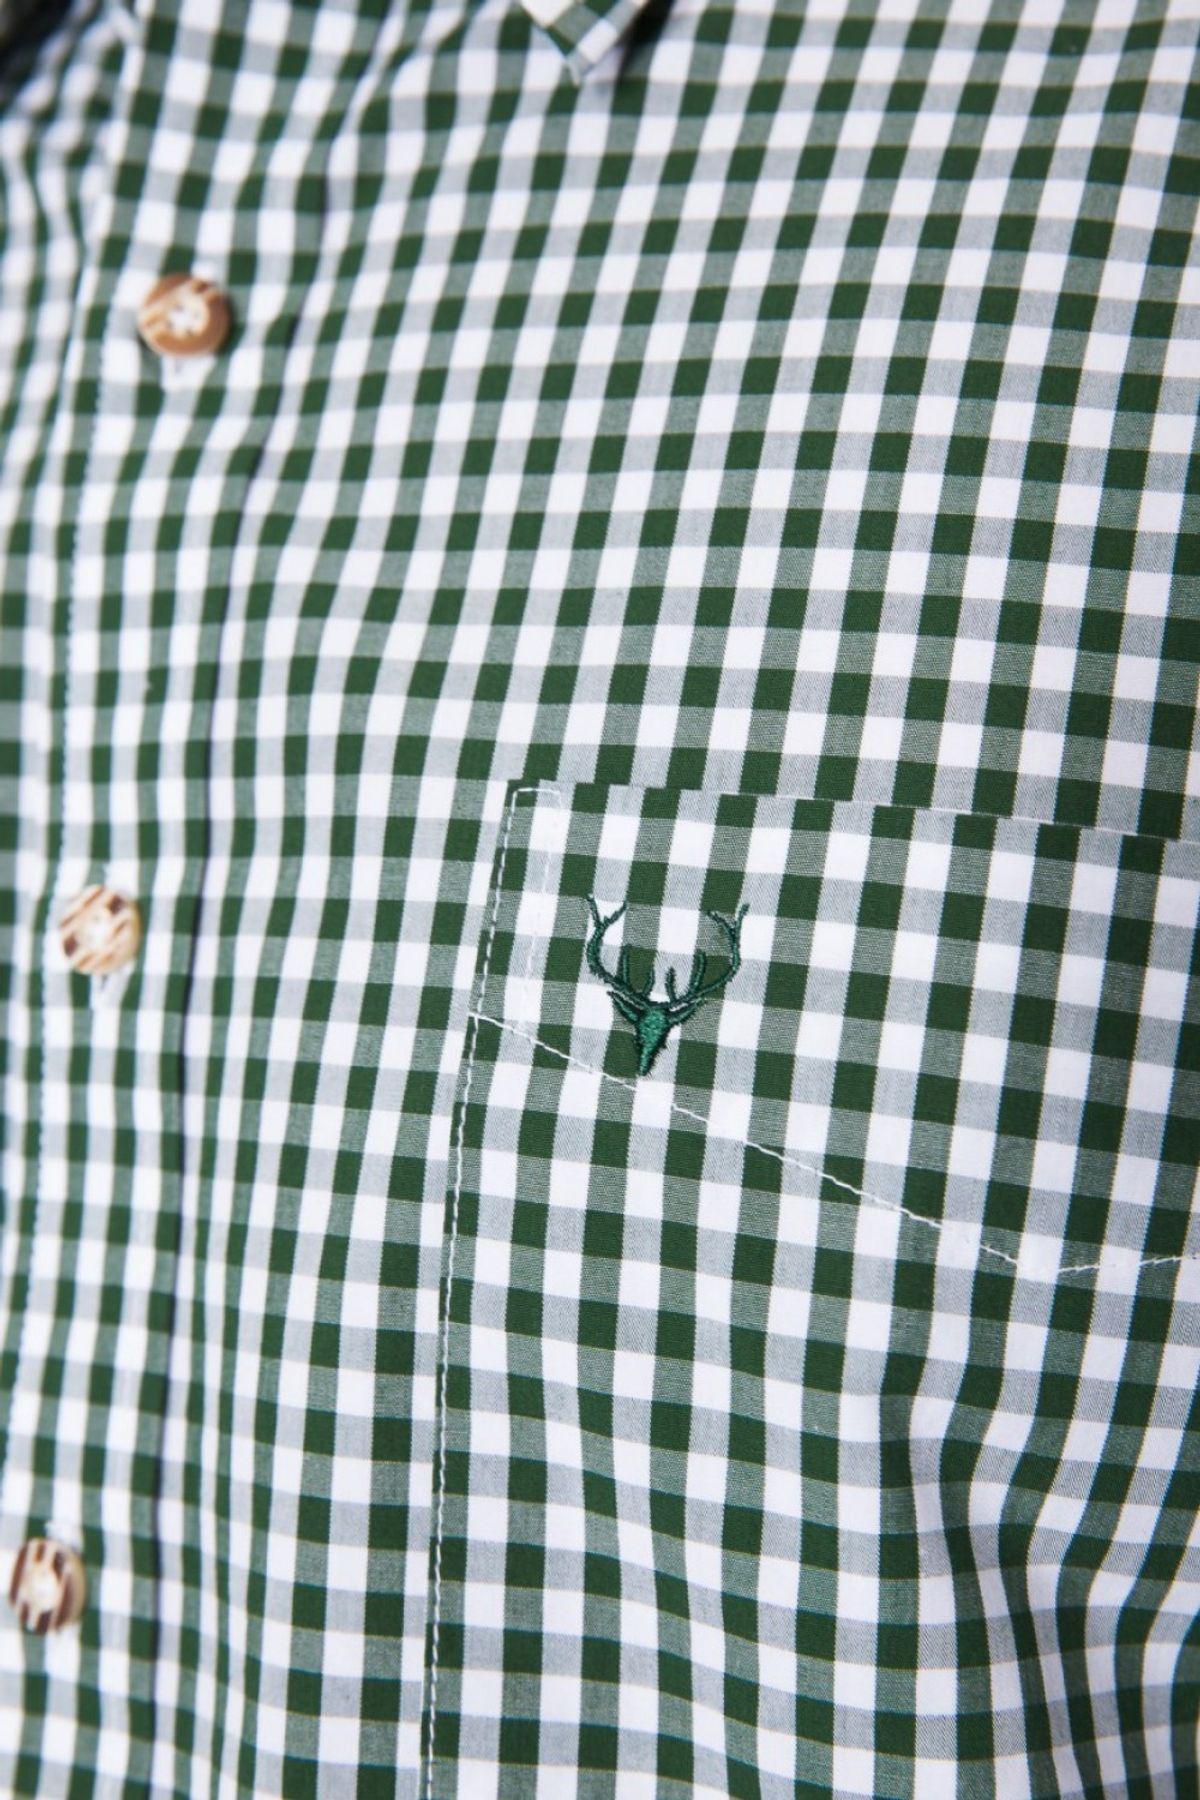 Krüger - Herren Trachtenhemd in grün, Tannengrün (951-156) – Bild 4